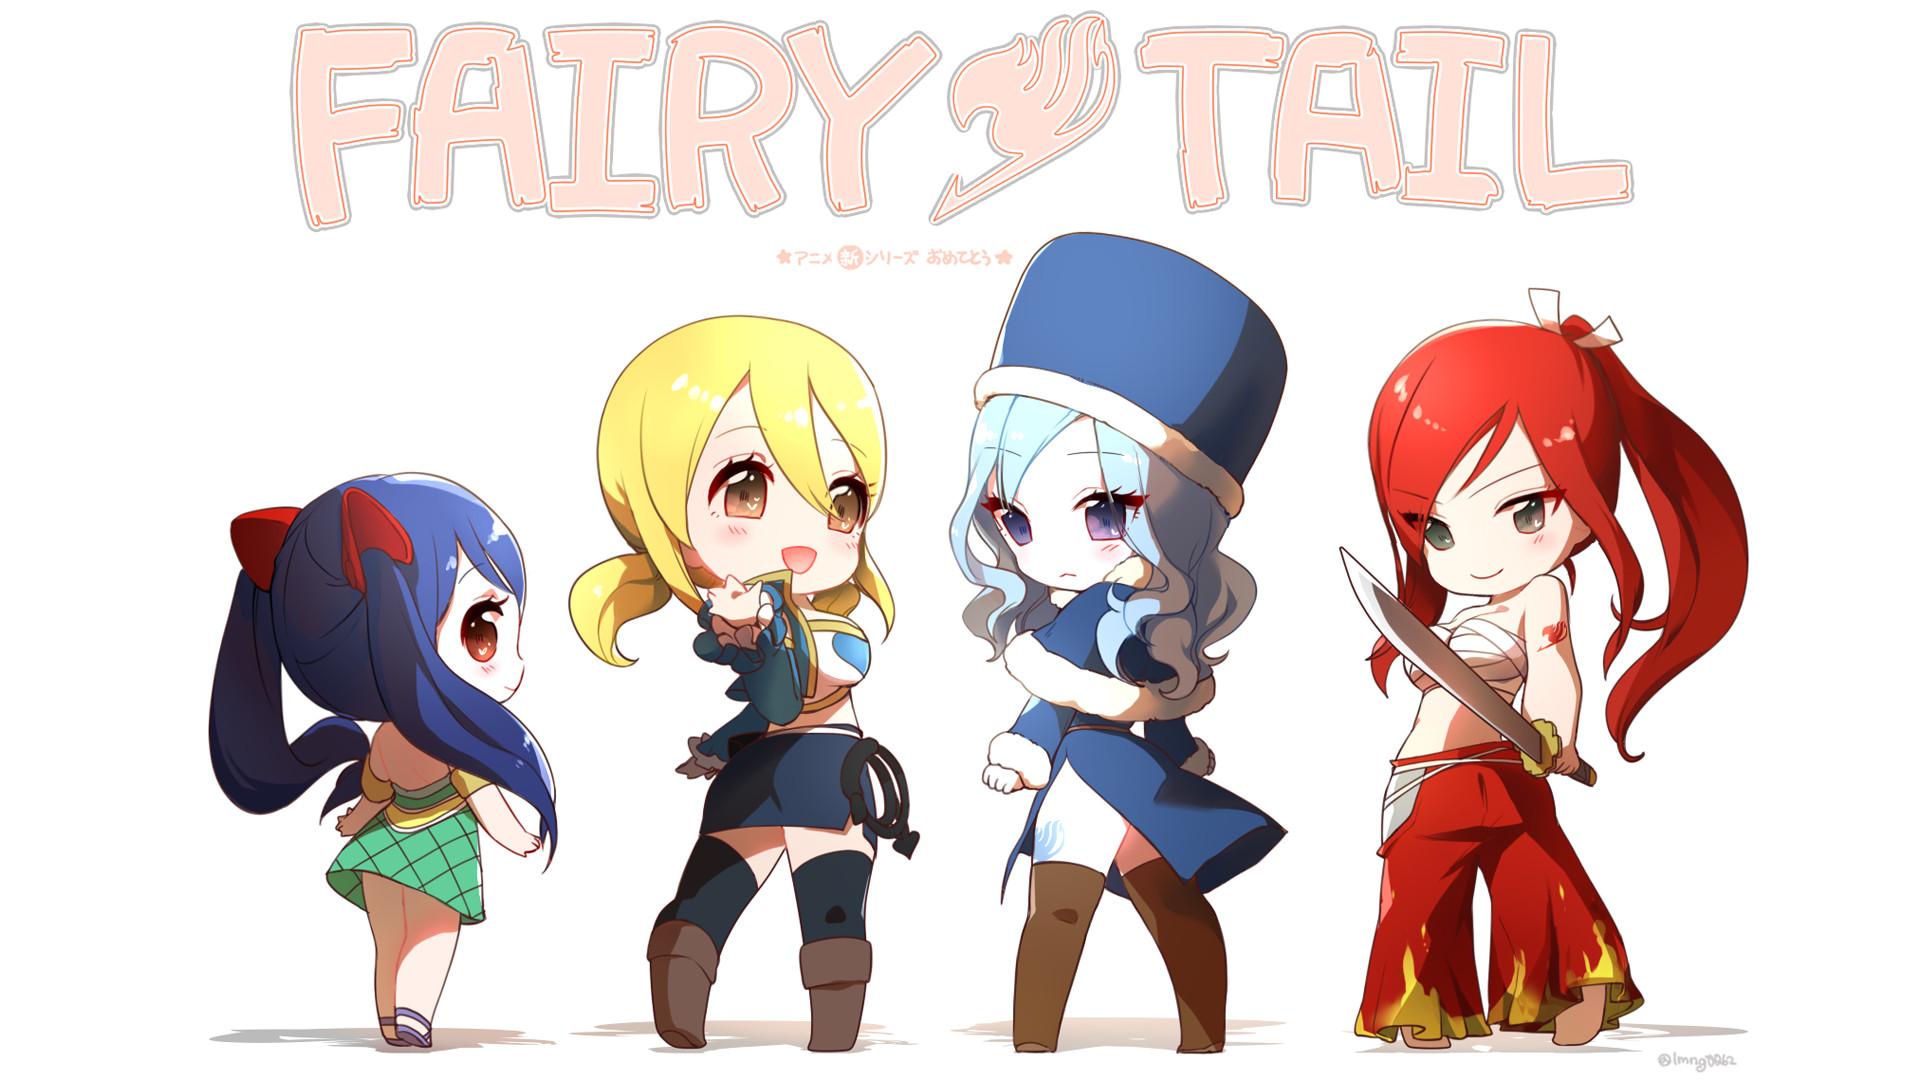 Fairy Tail Chibi Girls Wallpaper HD